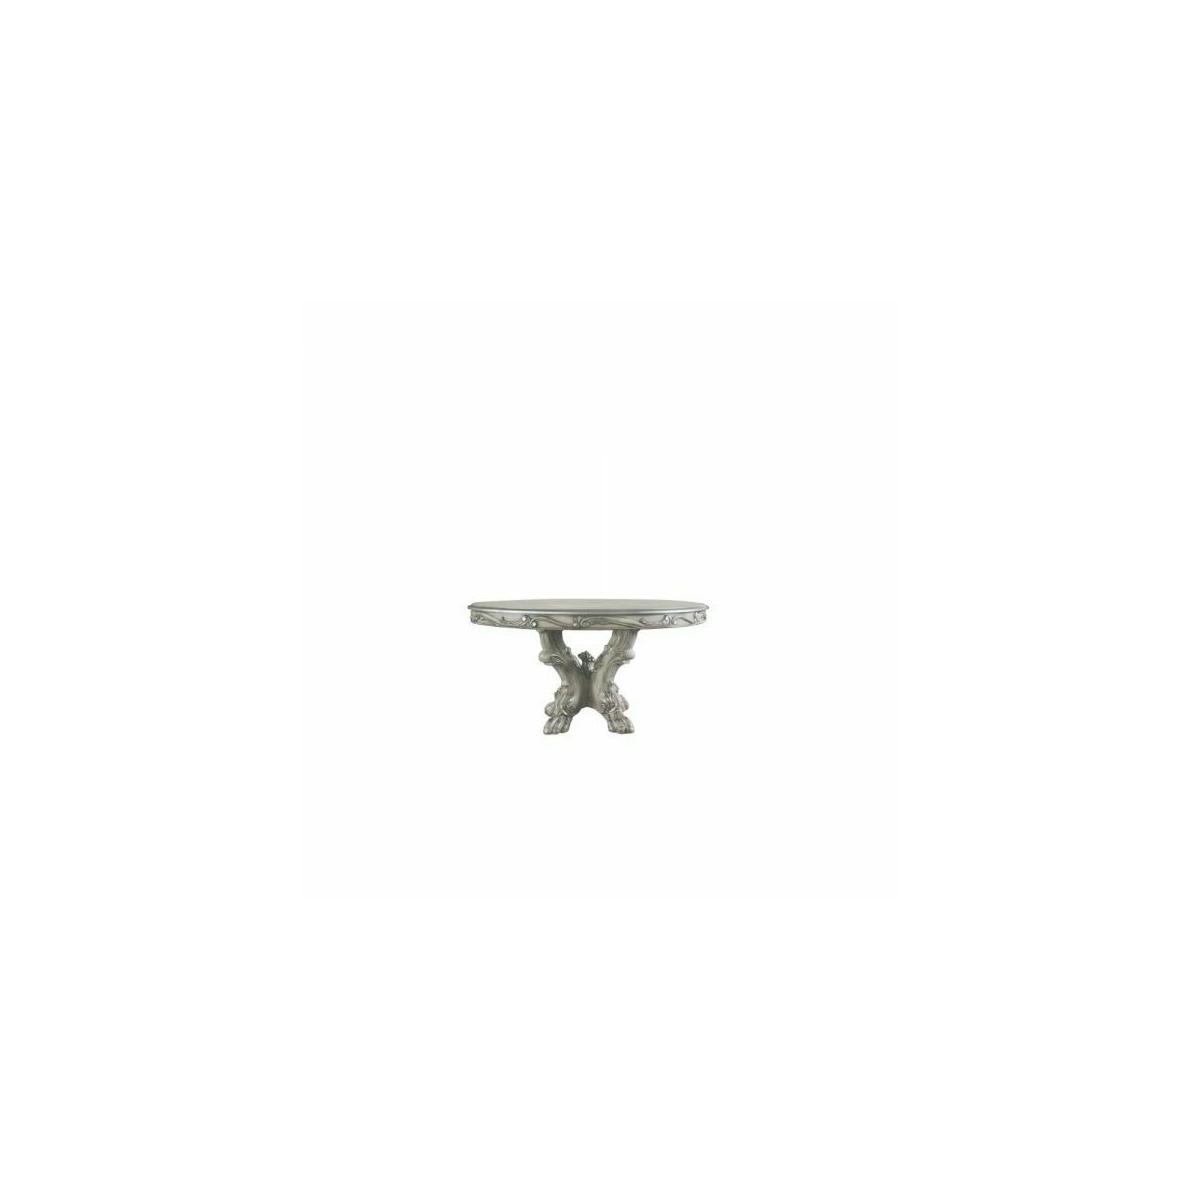 ACME Dresden Dining Table (Round) - 68180 - Traditional, Vintage - Wood (Poplar), Wood Veneer, Poly-Resin - Vintage Bone White